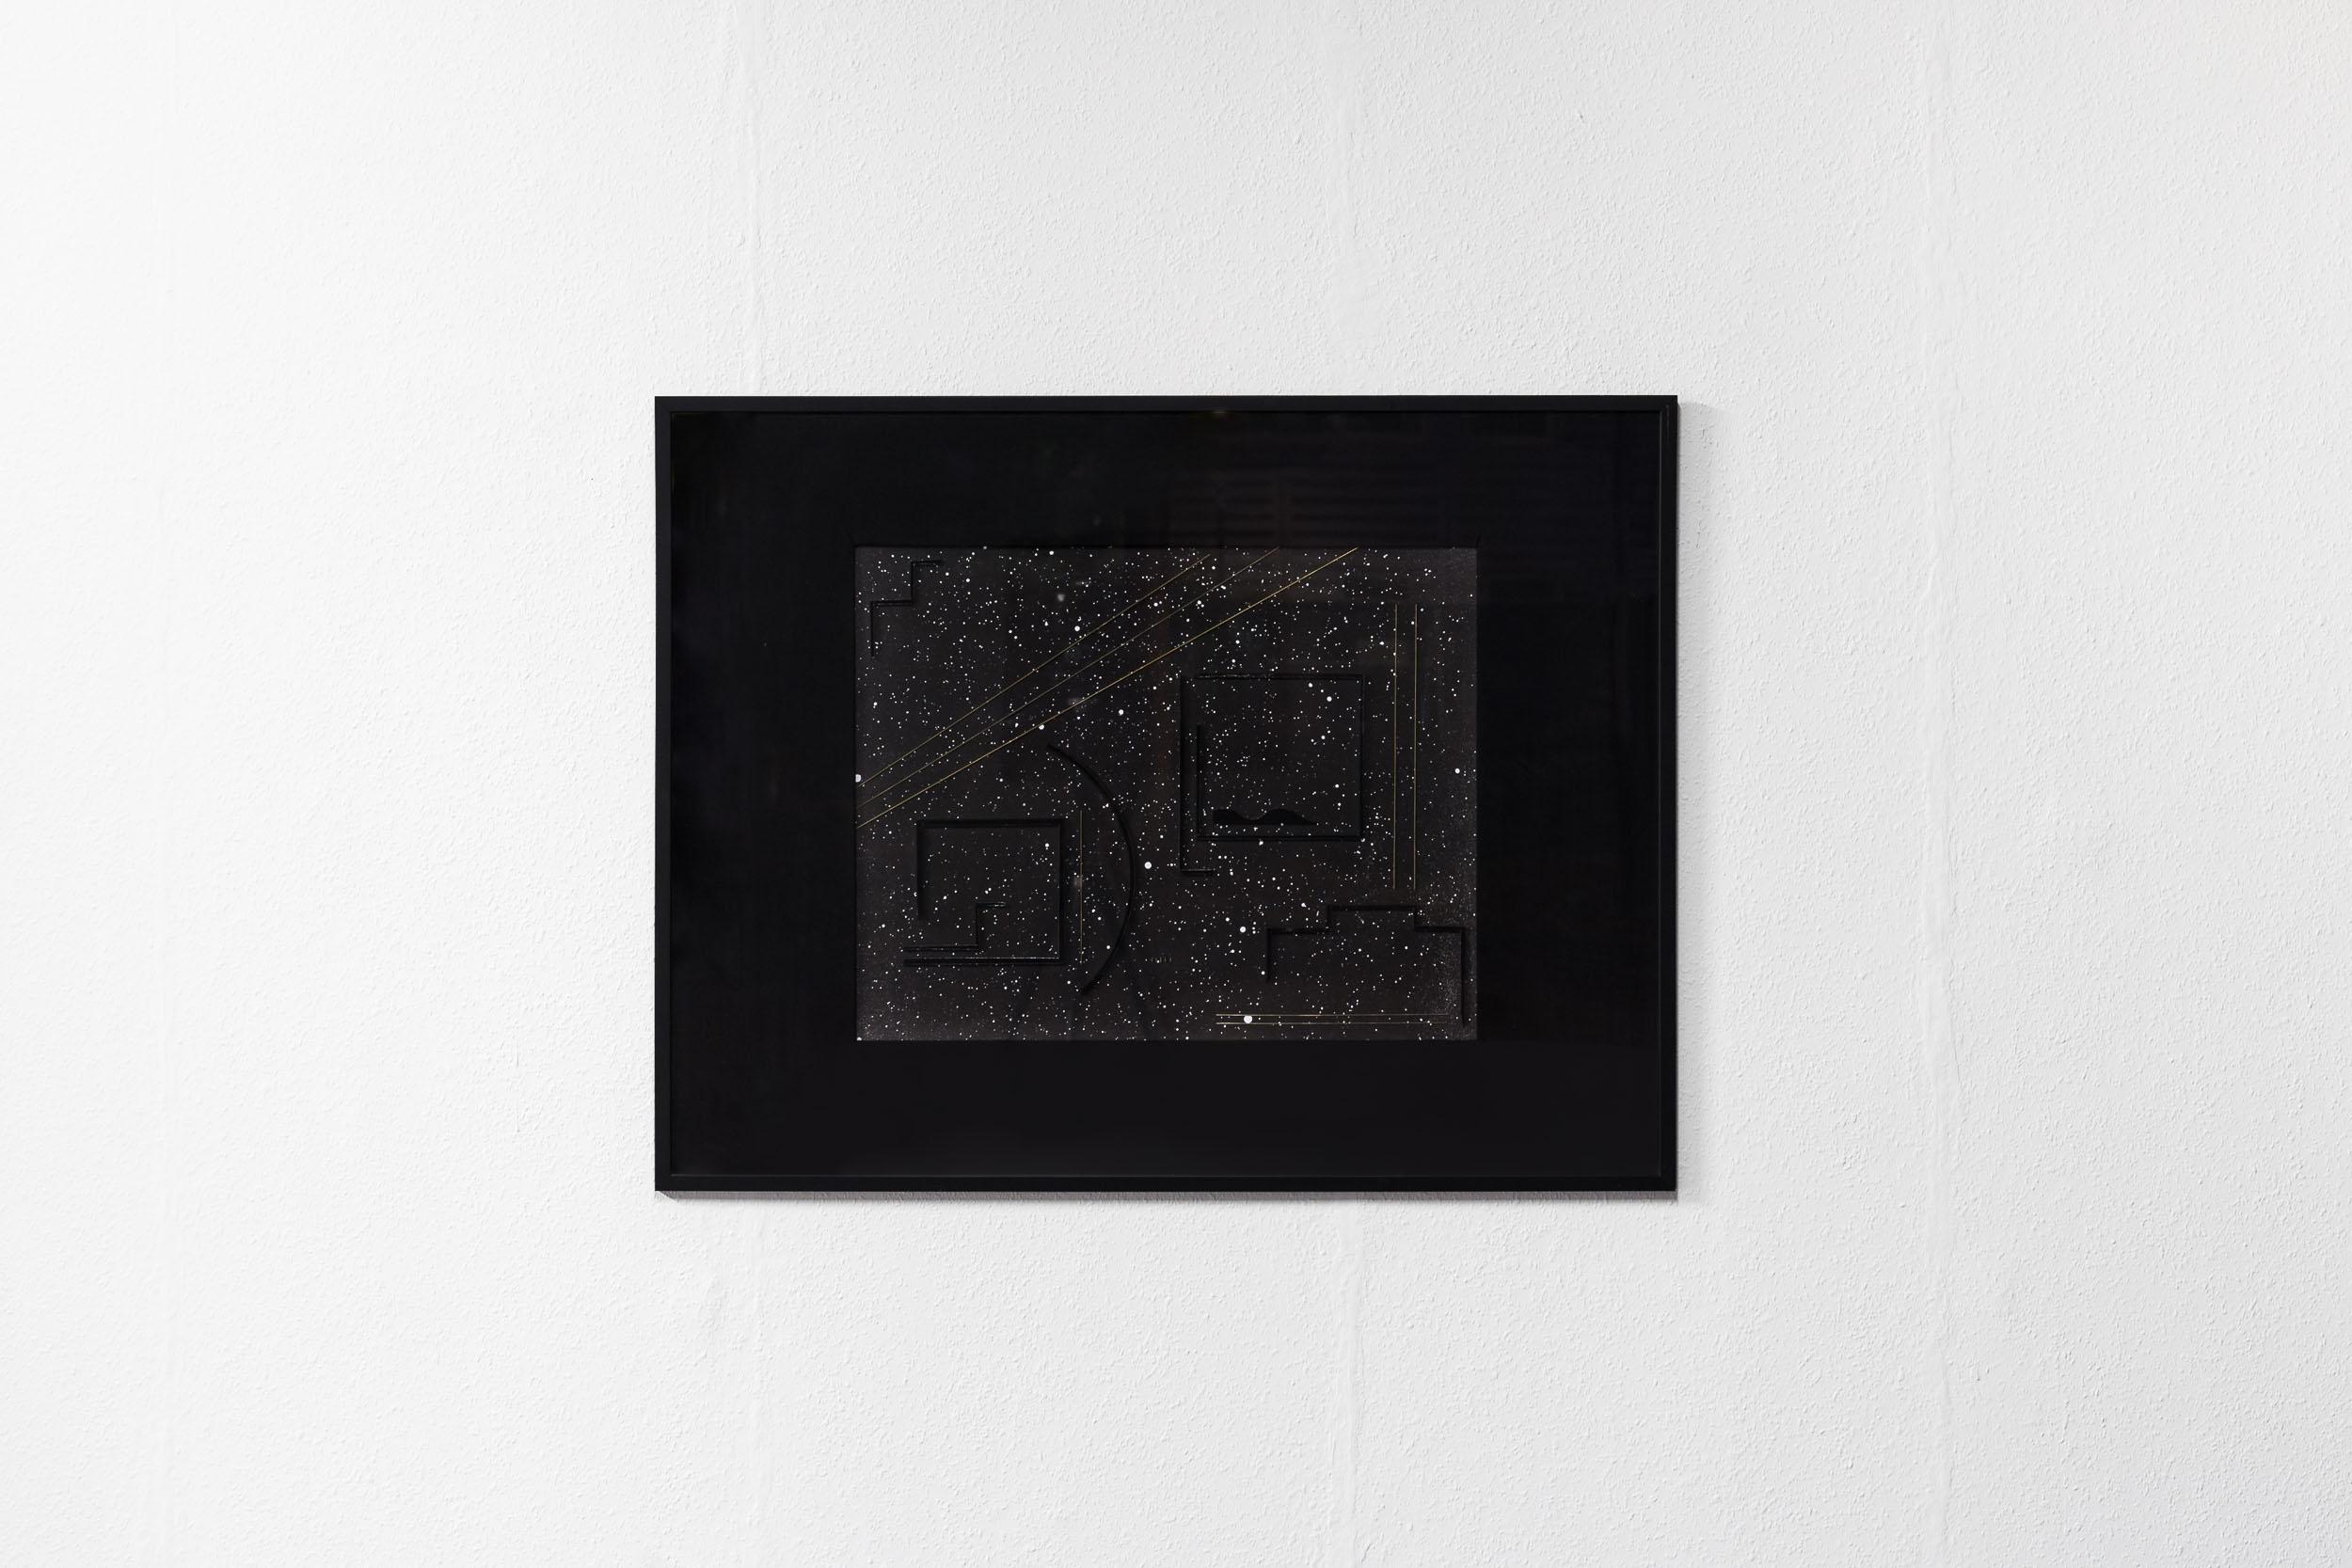 Kirstine Roepstorff,  Spherical Music 5 , 2012, Collage: cardboard, brass, 31 x 71 cm   Photo: Kilian Bannwart